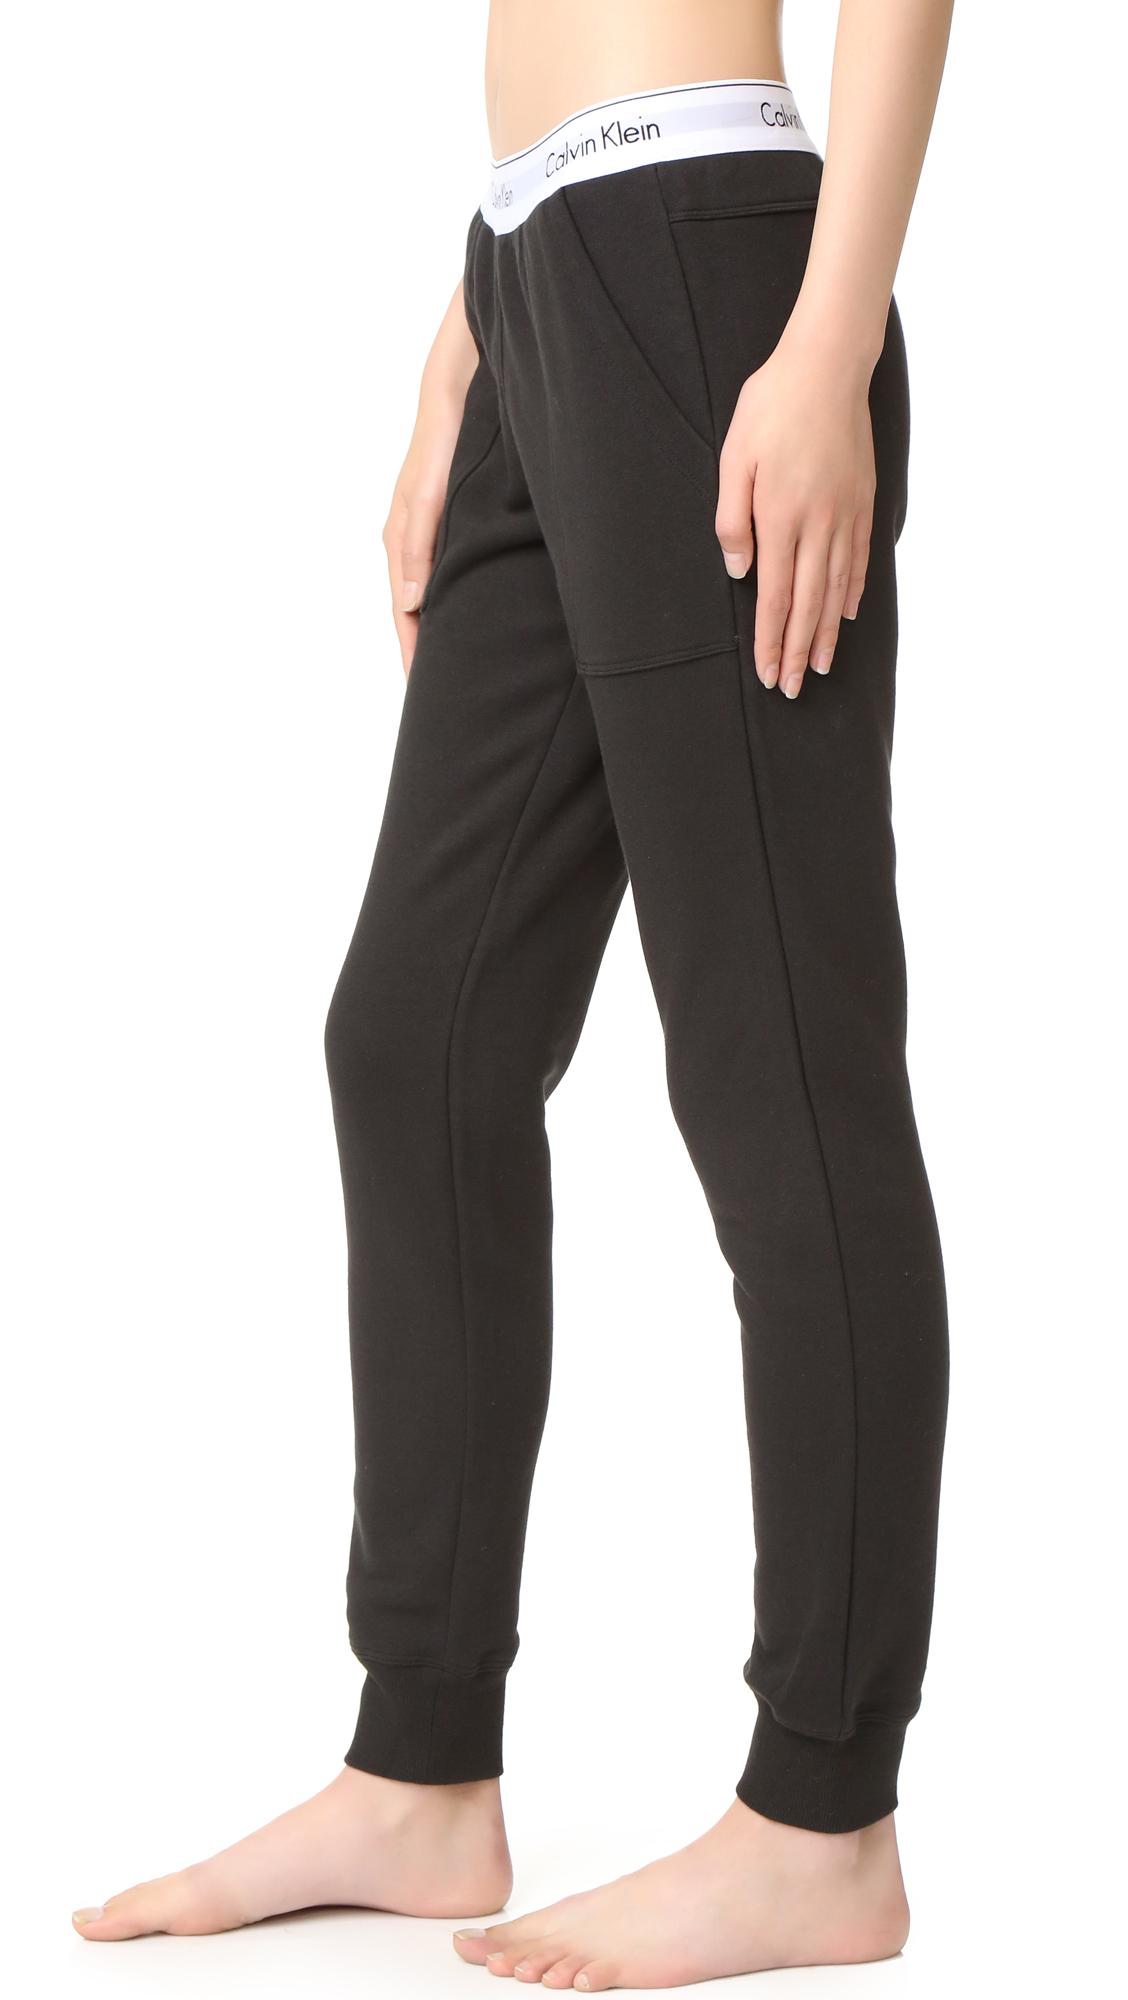 a1595cc1d2c70 Calvin Klein Underwear Modern Cotton Jogger Pants | SHOPBOP